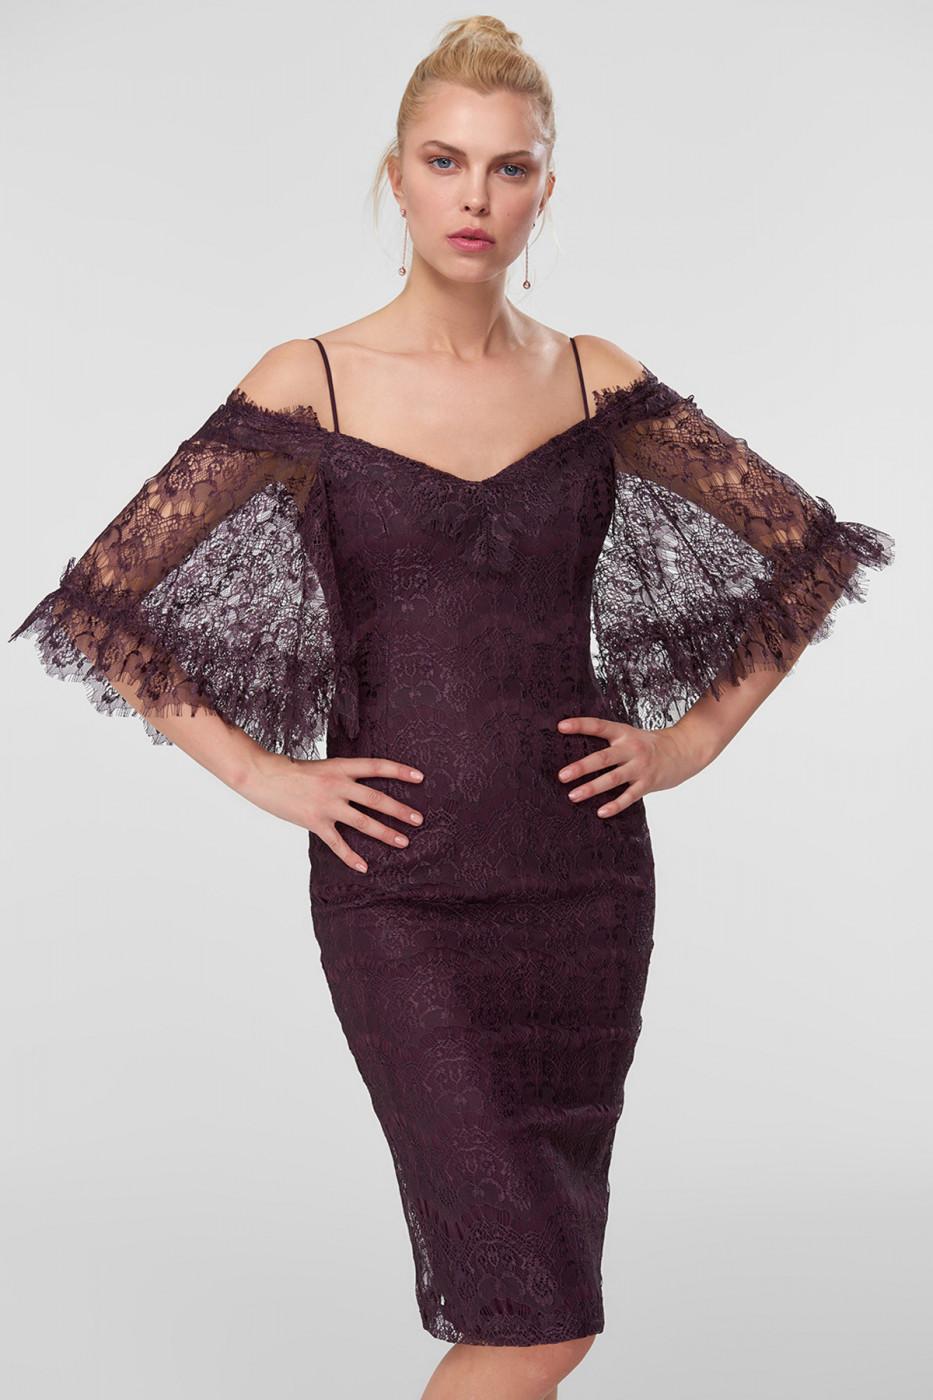 4fcdae1ee024d Trendyol Plum Branch Flanged Lace Dress - ALIATIC